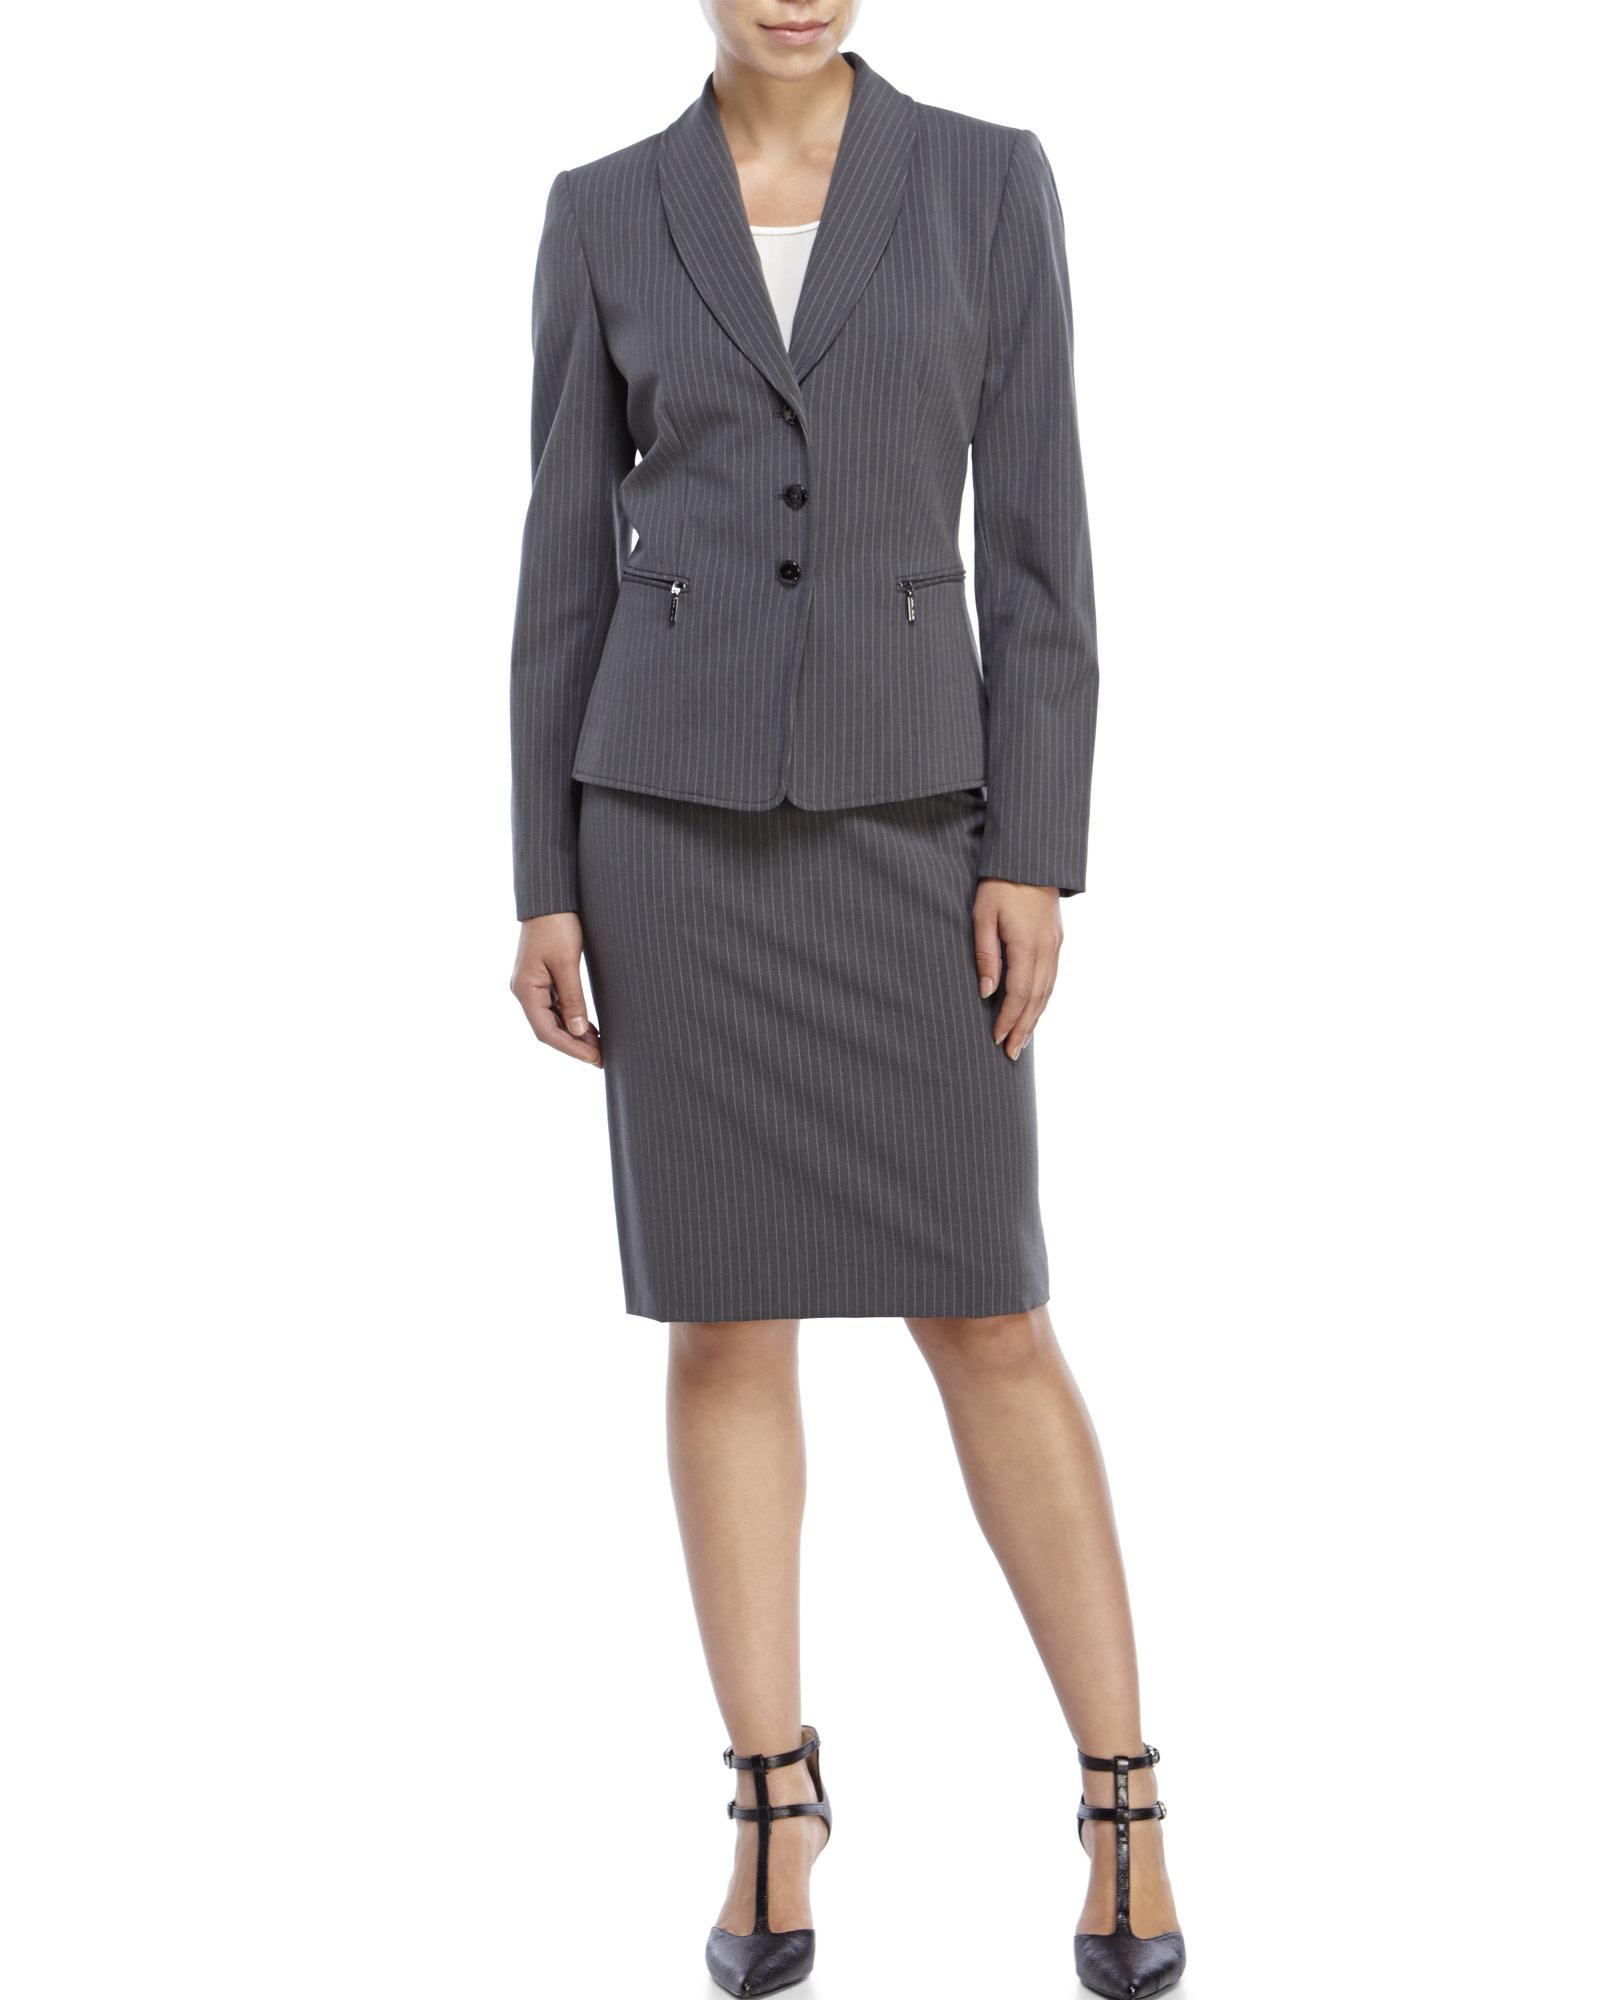 Tahari Two-Piece Pinstripe Skirt Suit in Gray   Lyst